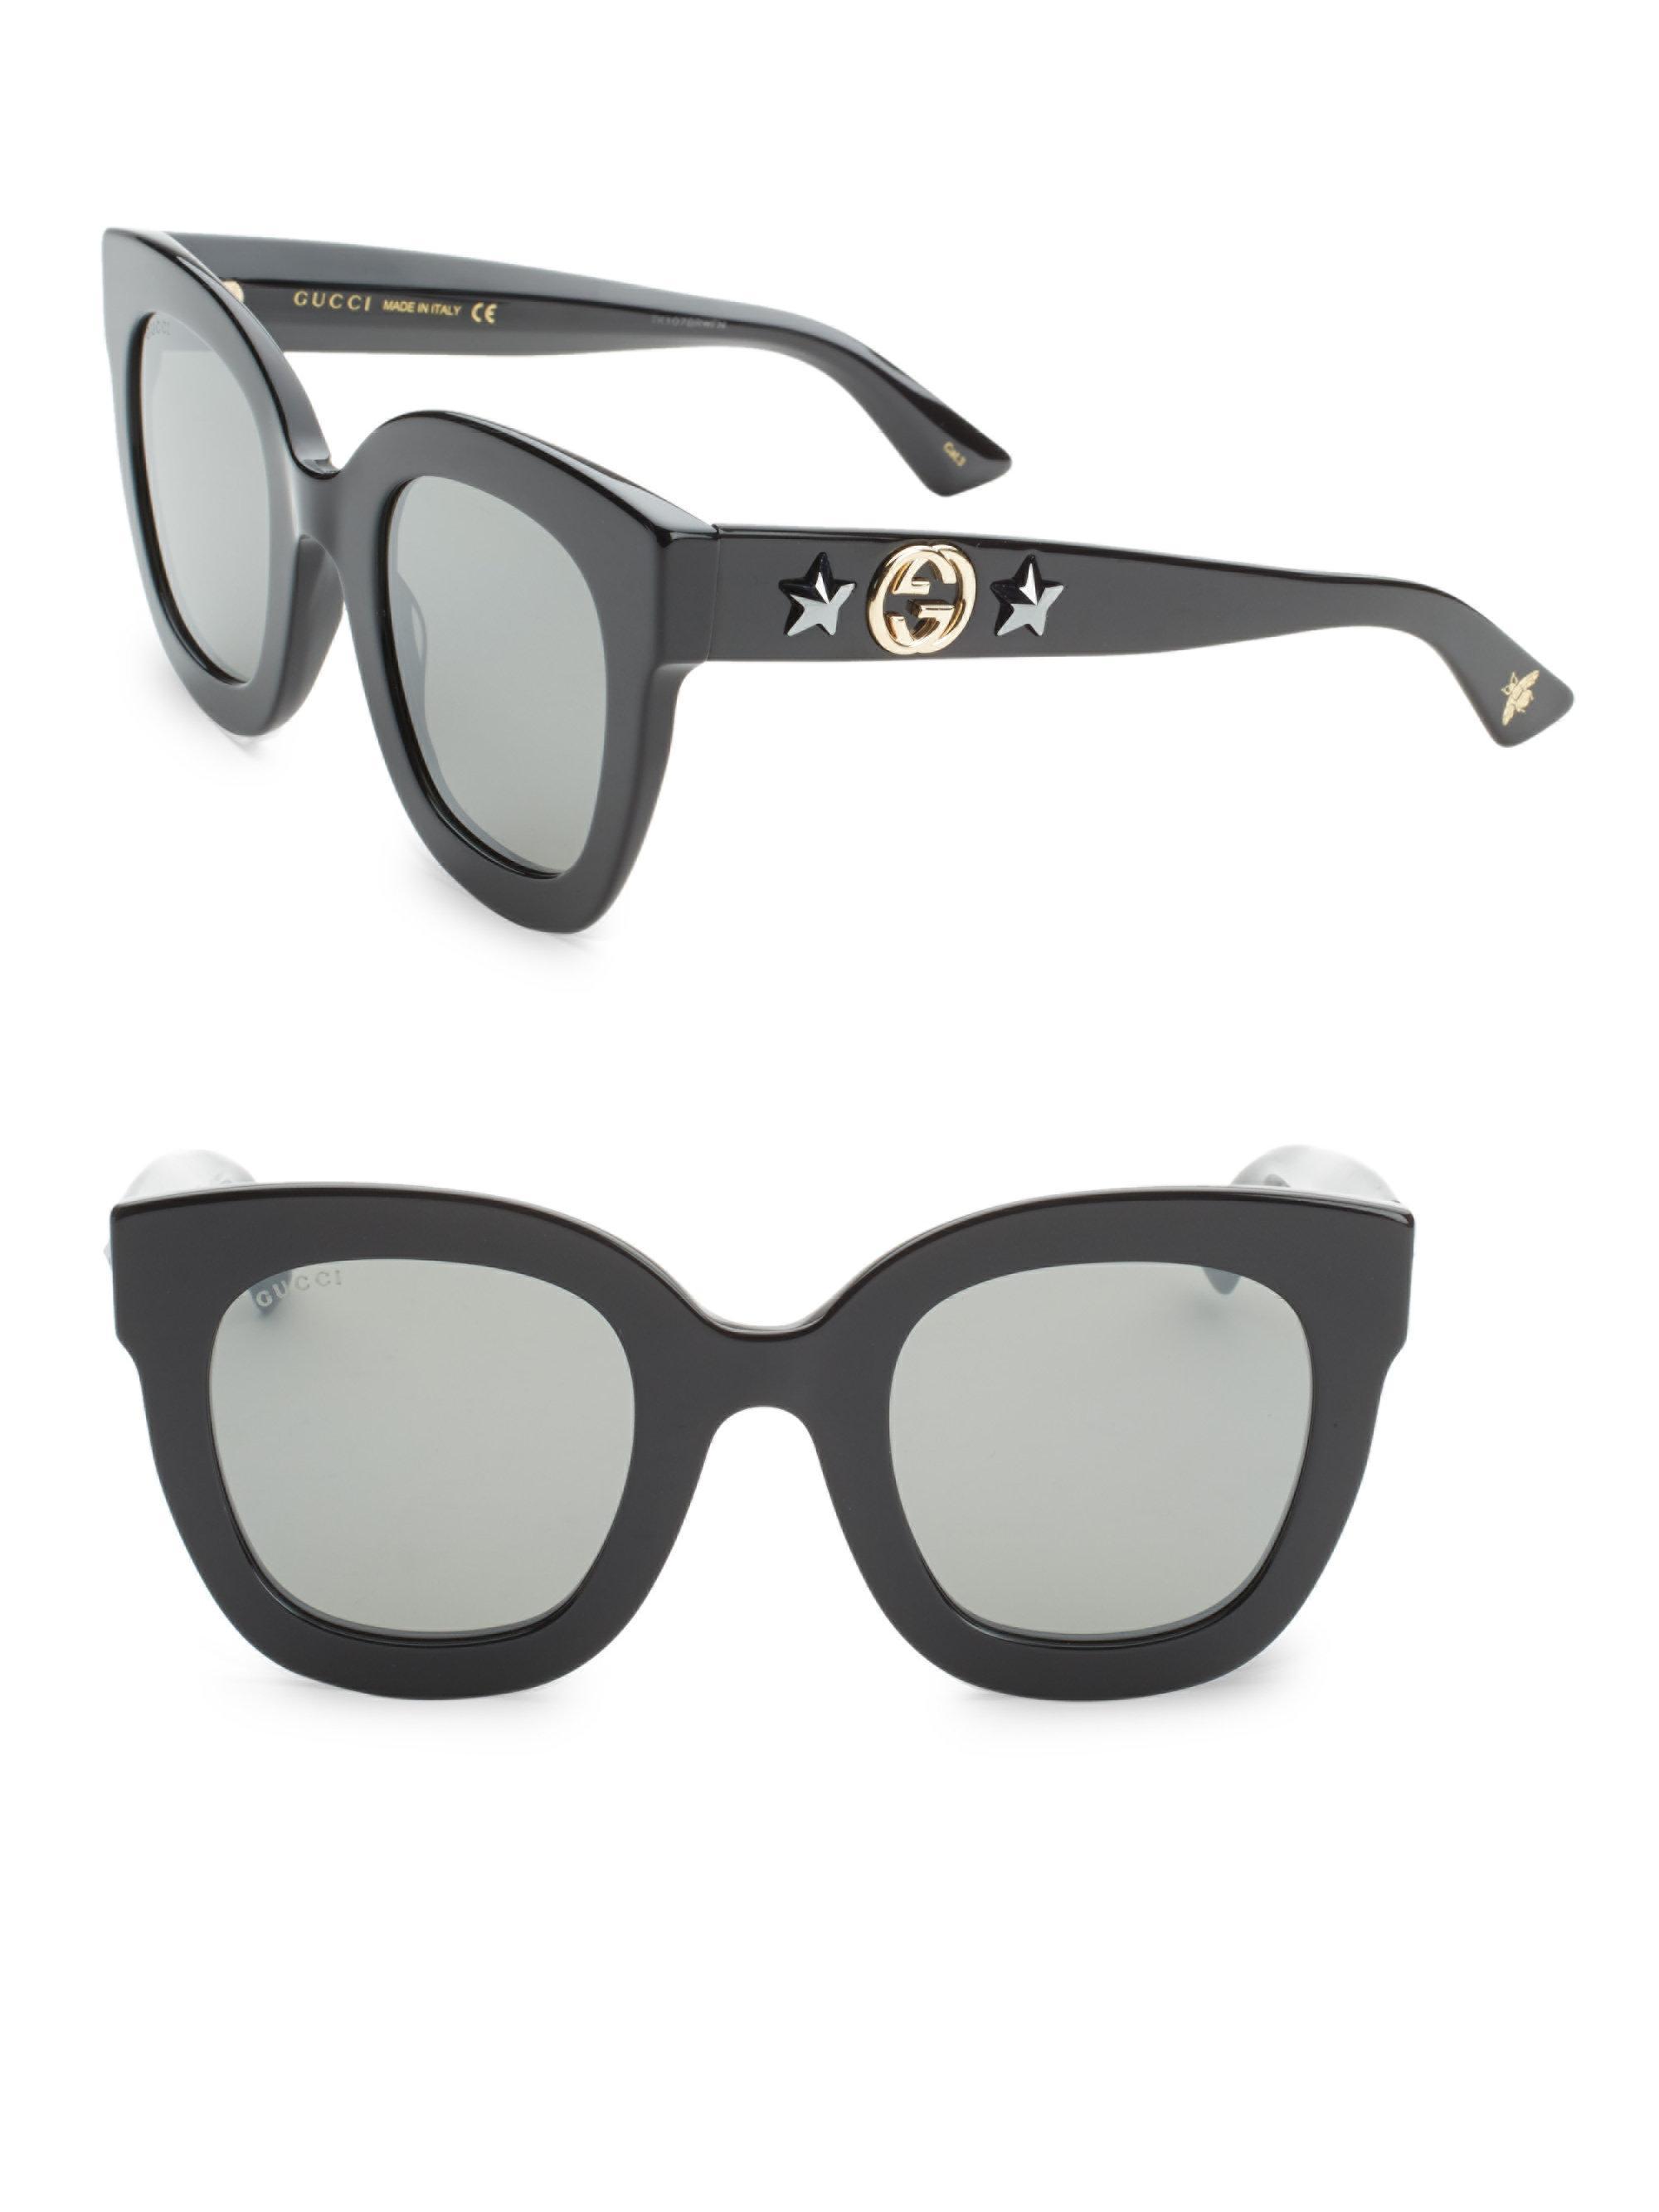 Black Oversized Rectangular Sunglasses Gucci rtQSR1Ig